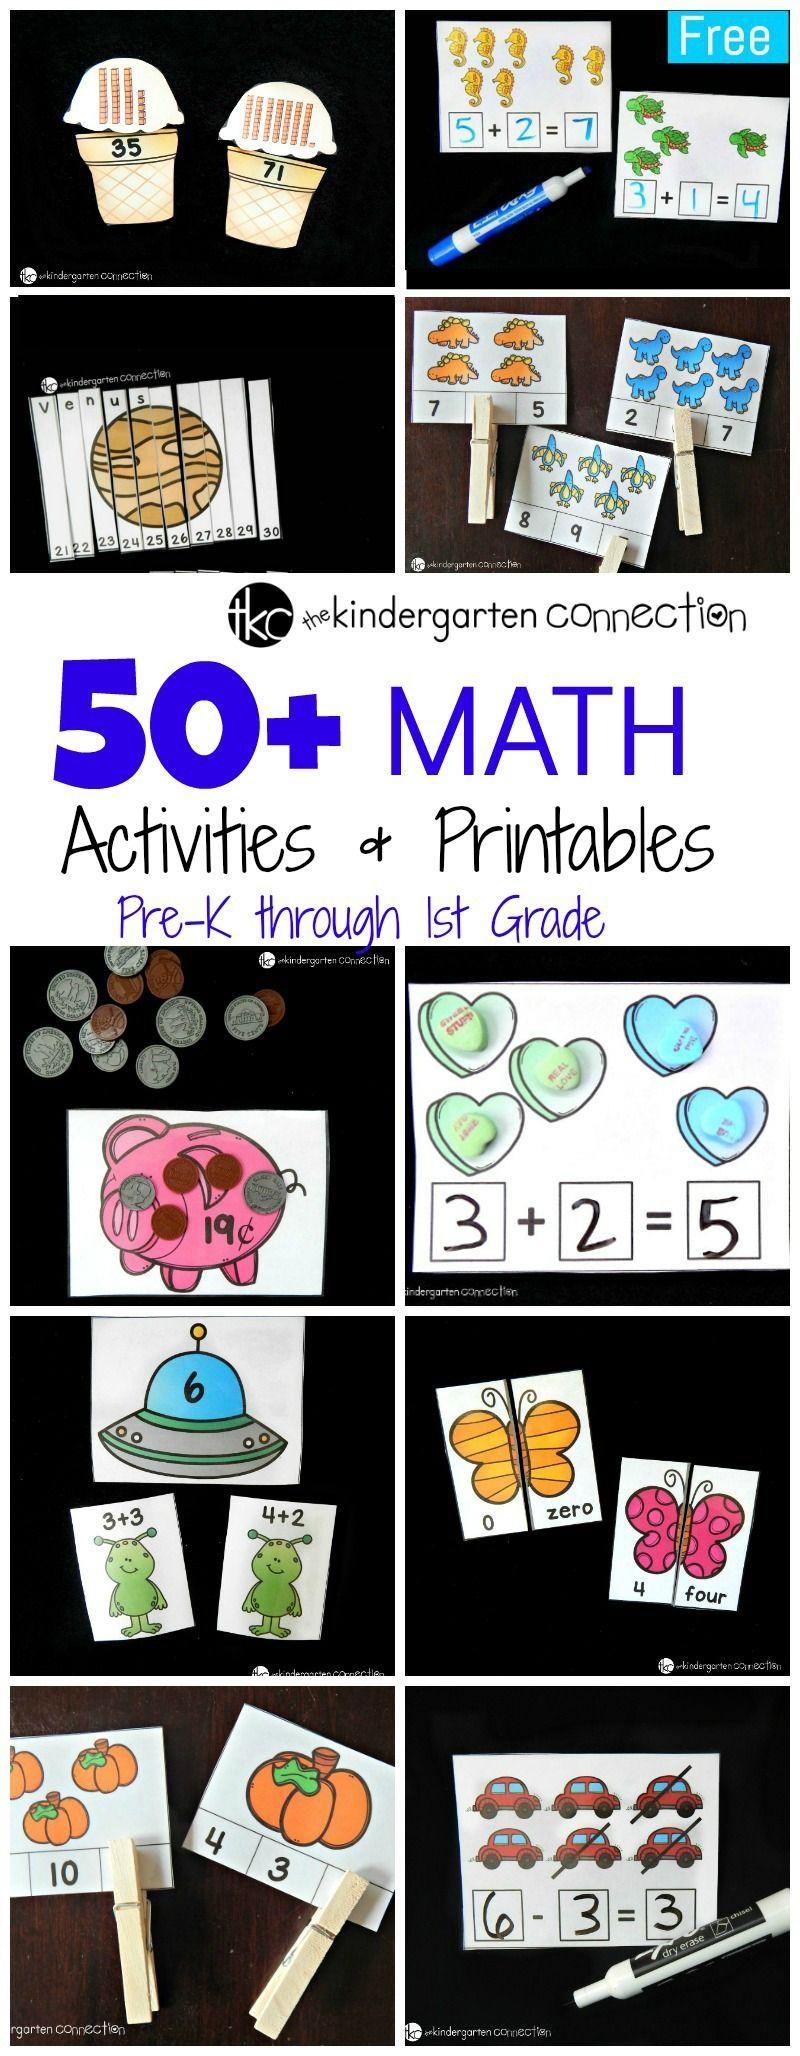 50 Incredible Math Printables And Activities The Kindergarten Connection Math Activities Preschool Math For Kids Math Printables [ 2056 x 800 Pixel ]